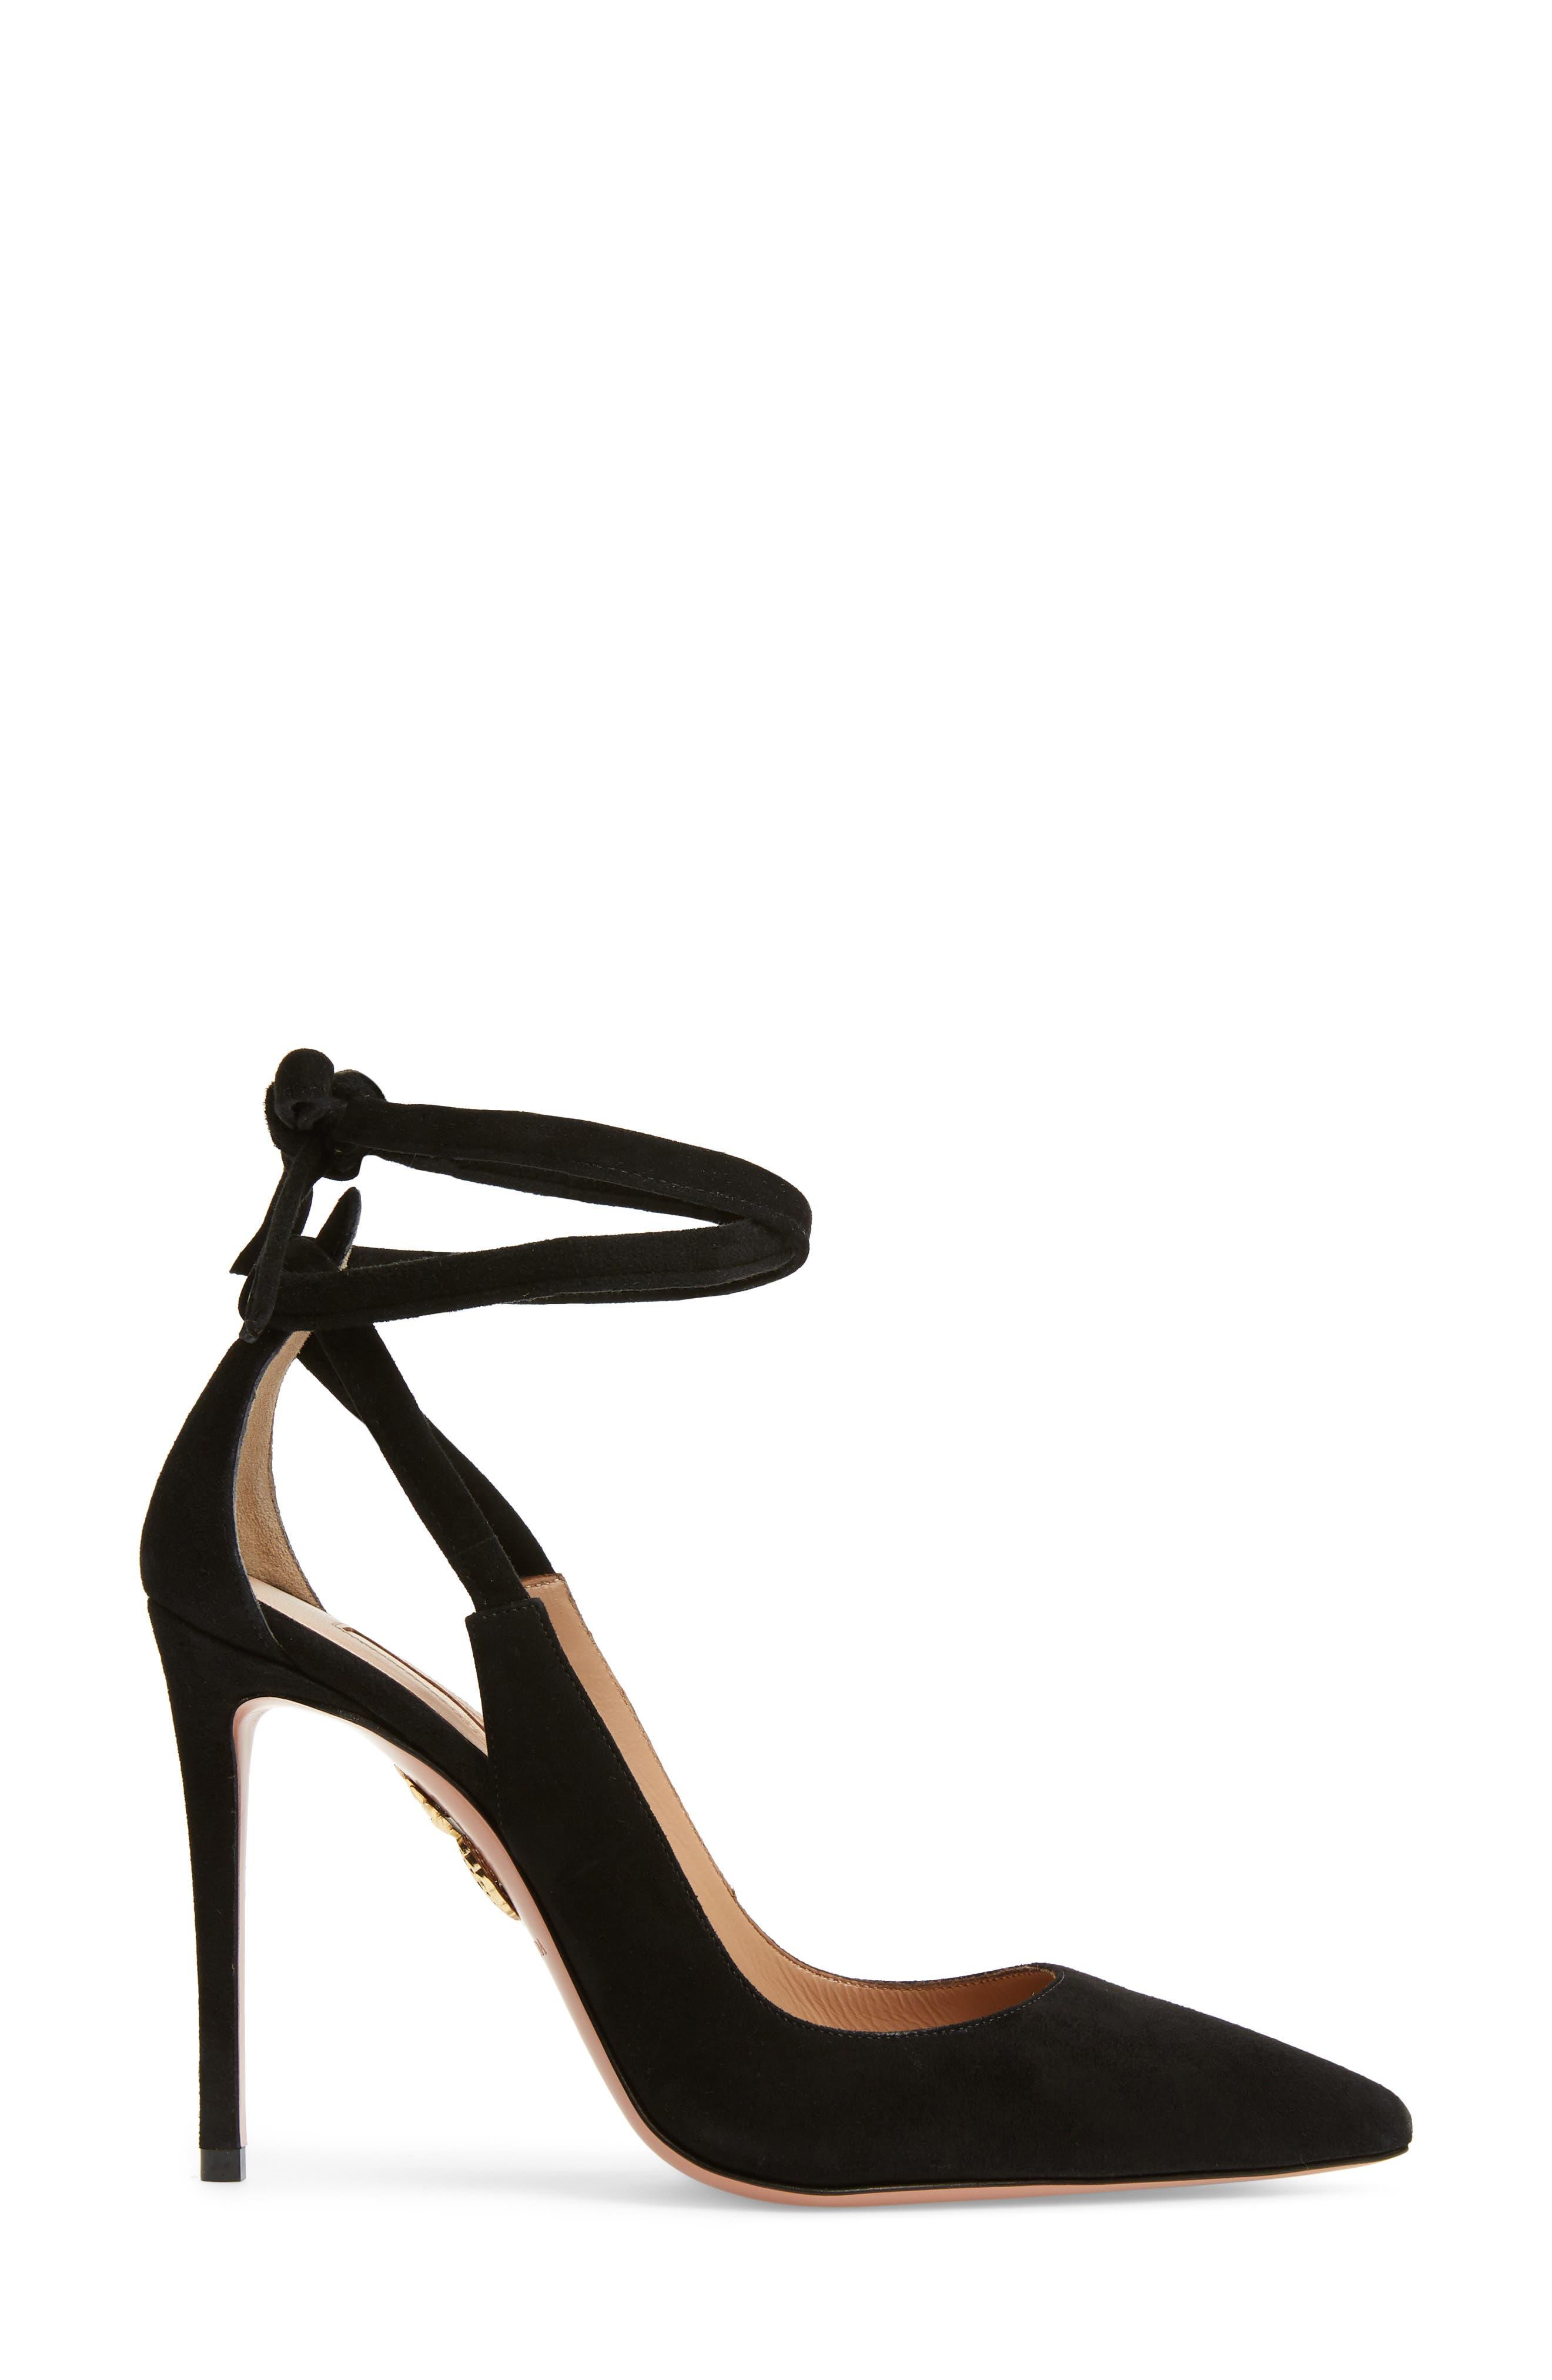 Milano Ankle Tie Pump,                             Alternate thumbnail 3, color,                             BLACK